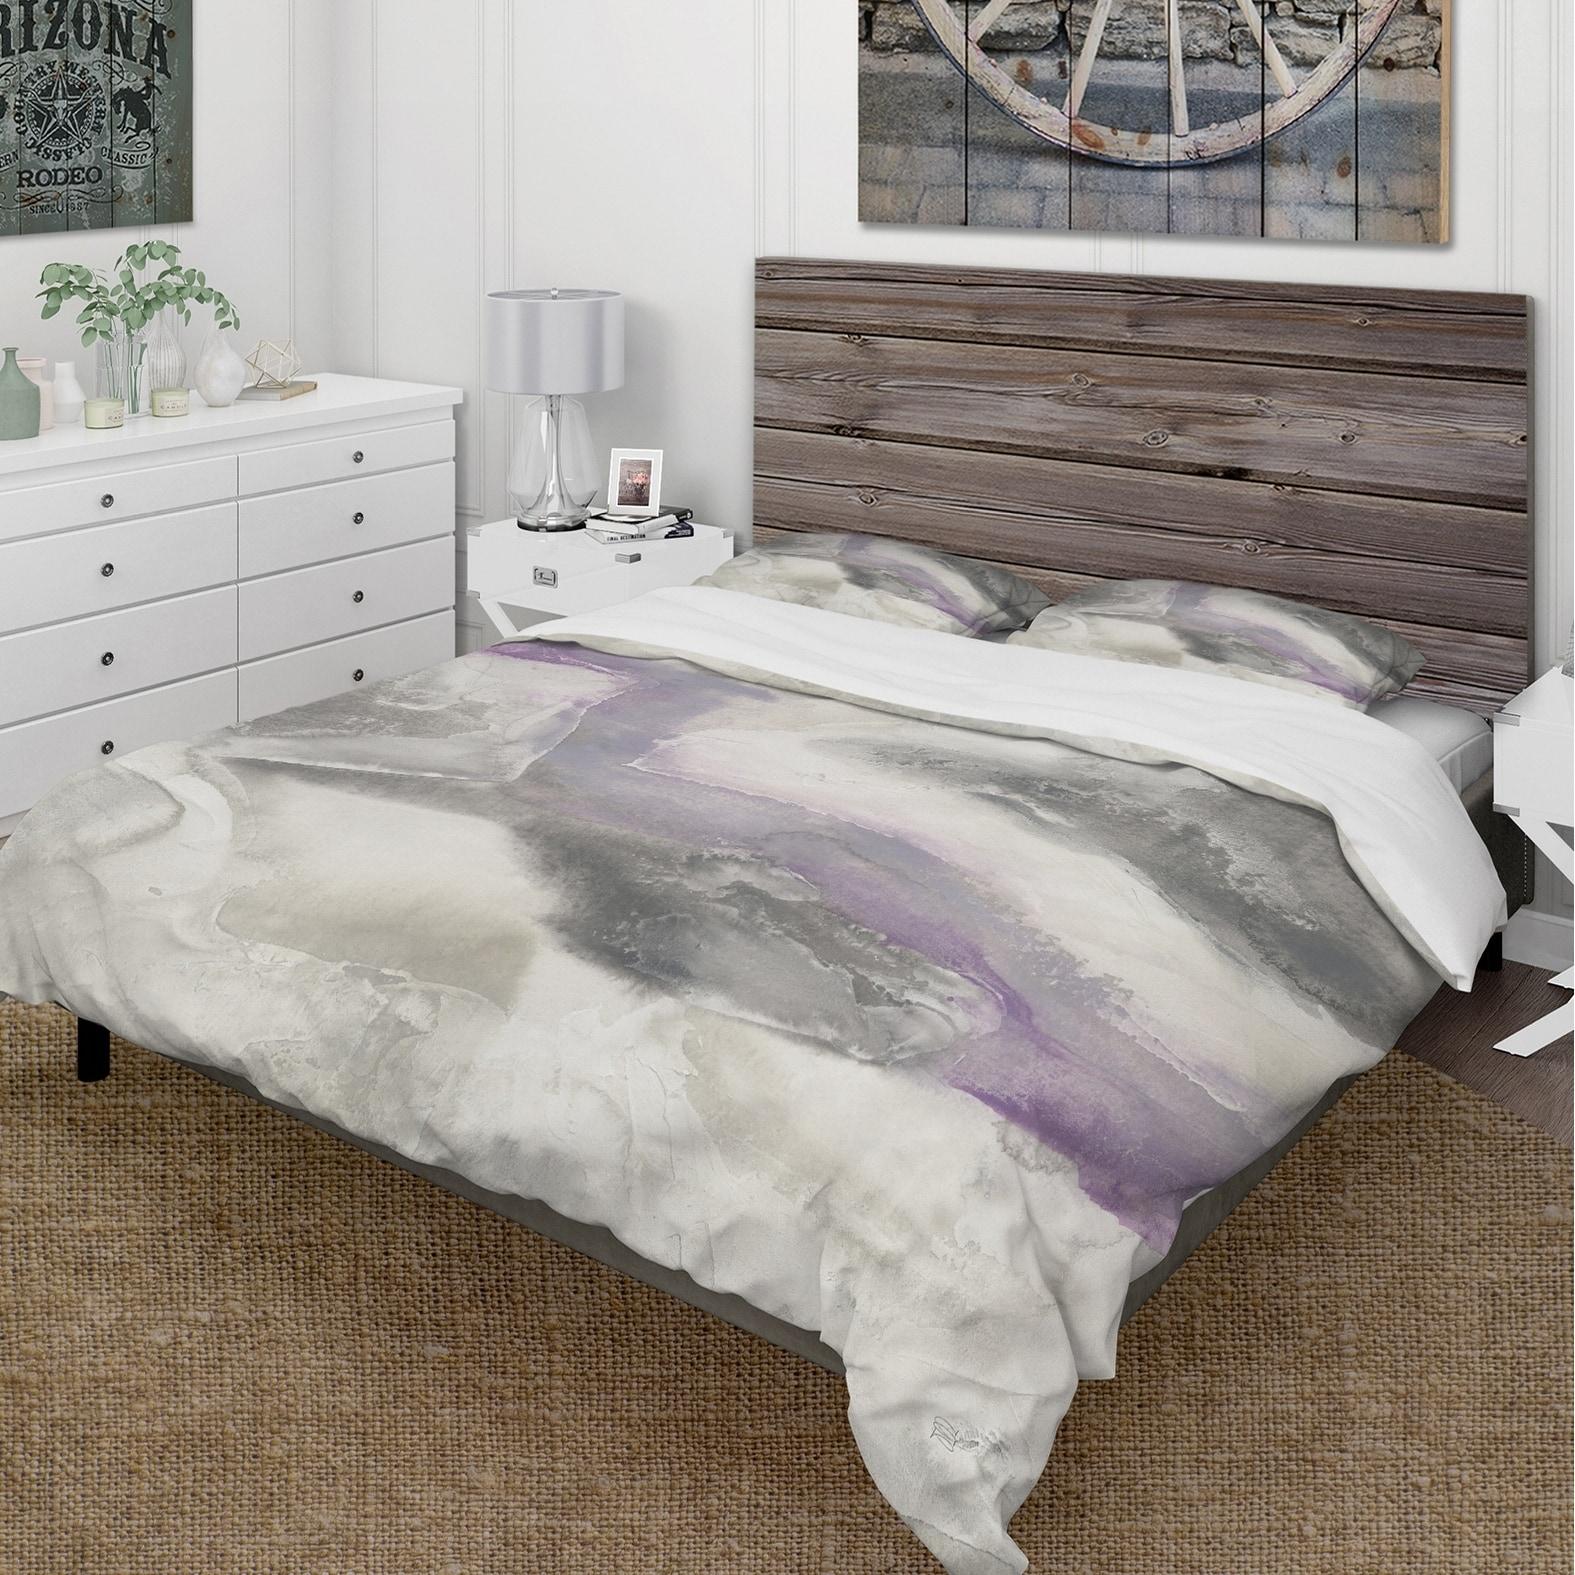 Violet Cottage Floral Printed Duvet Quilt Cover And Pillow Case Bedding Set Home Garden Duvet Covers Bedding Sets